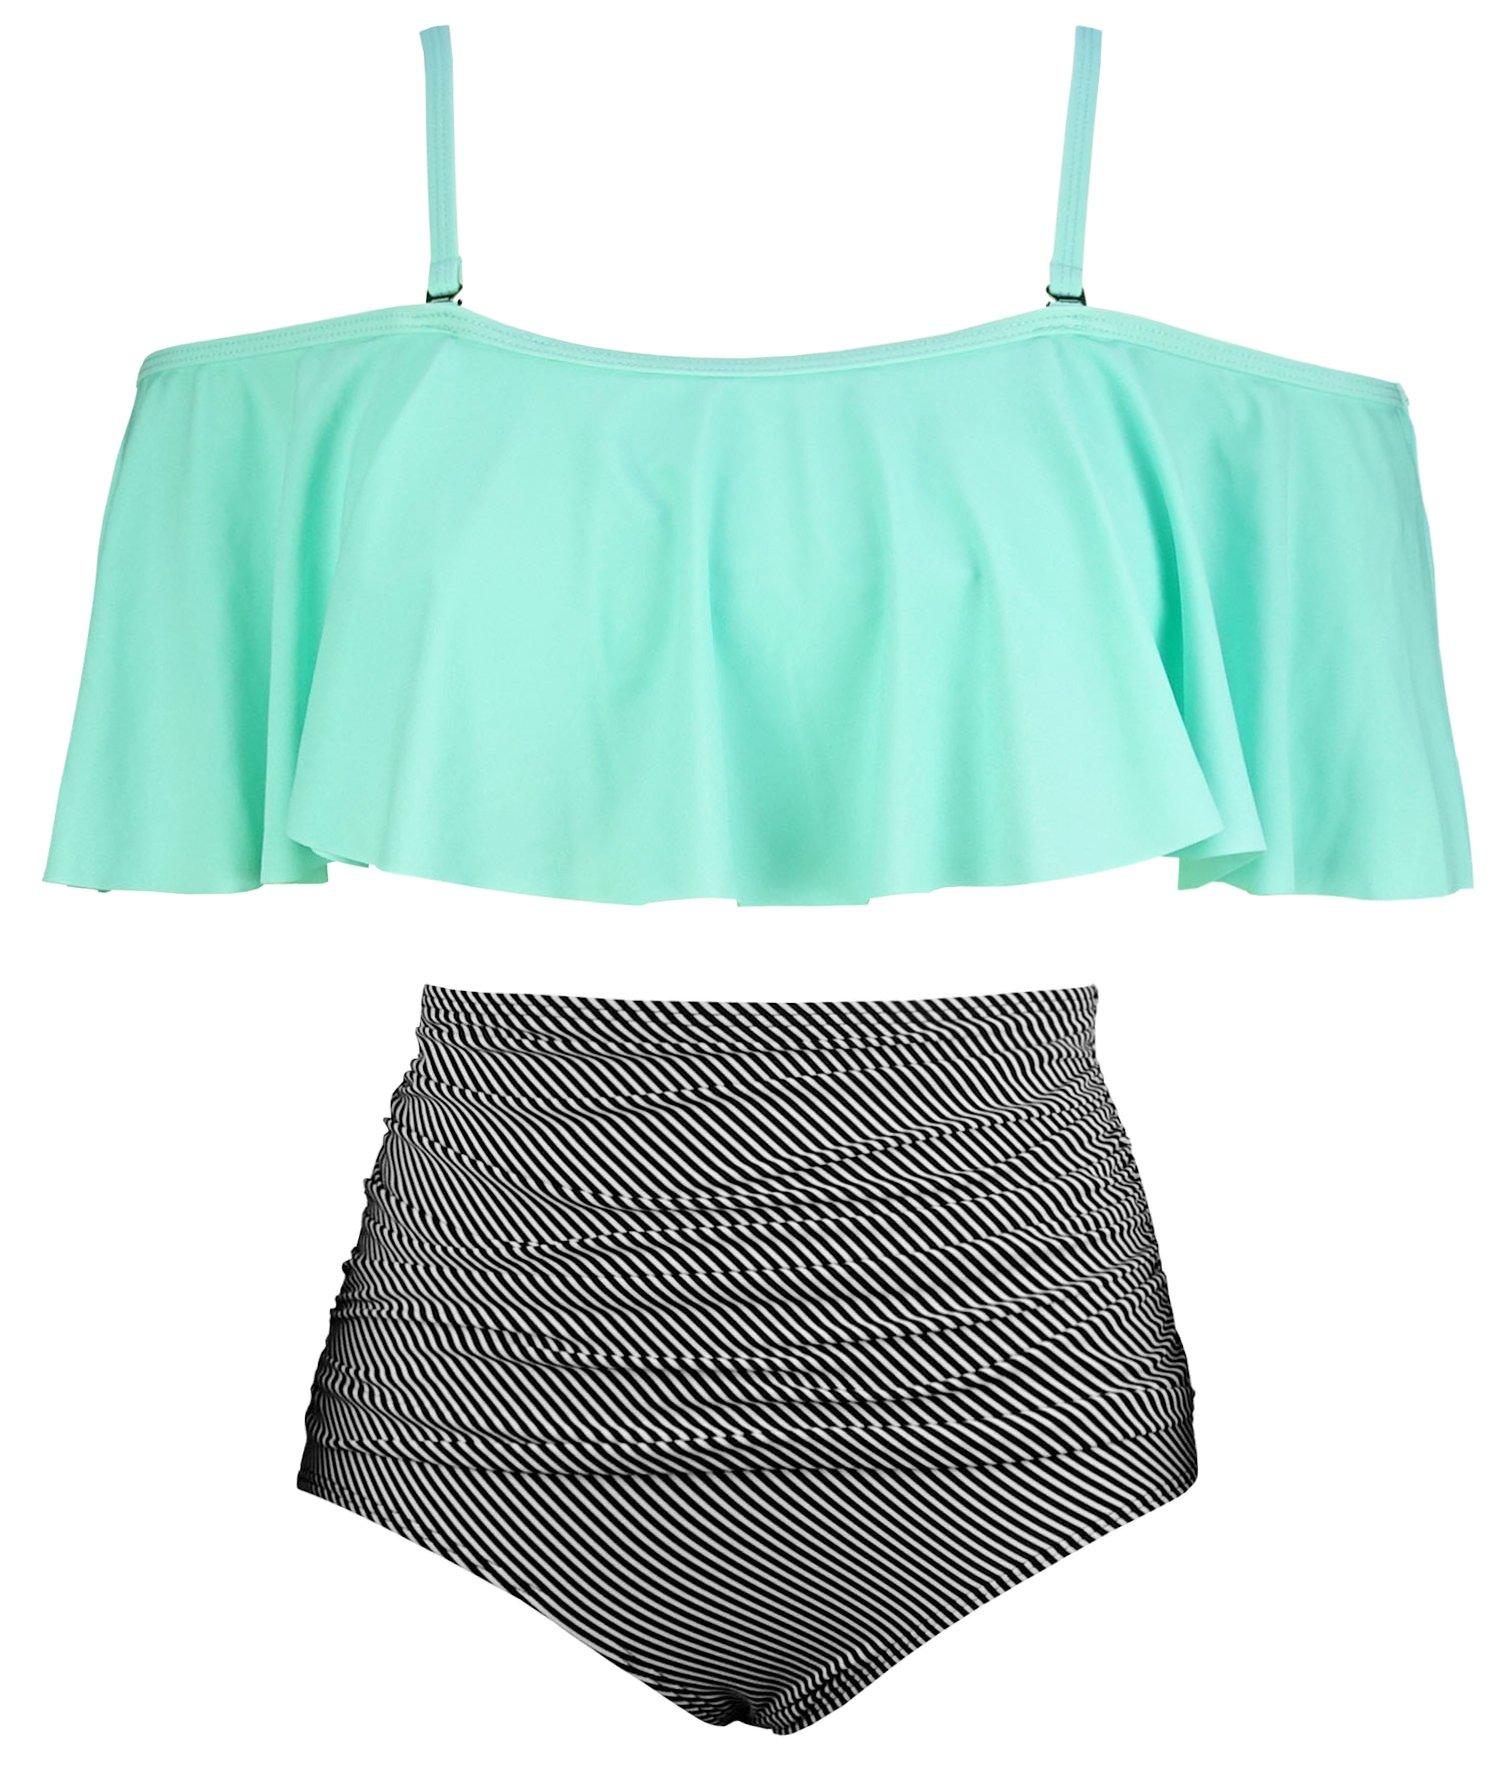 COCOSHIP Pale Green & Black Striated Vintage Ruched Bikini Set Flounce Falbala Top Tiered Ruched High Waist Swimsuit Swimwear 14